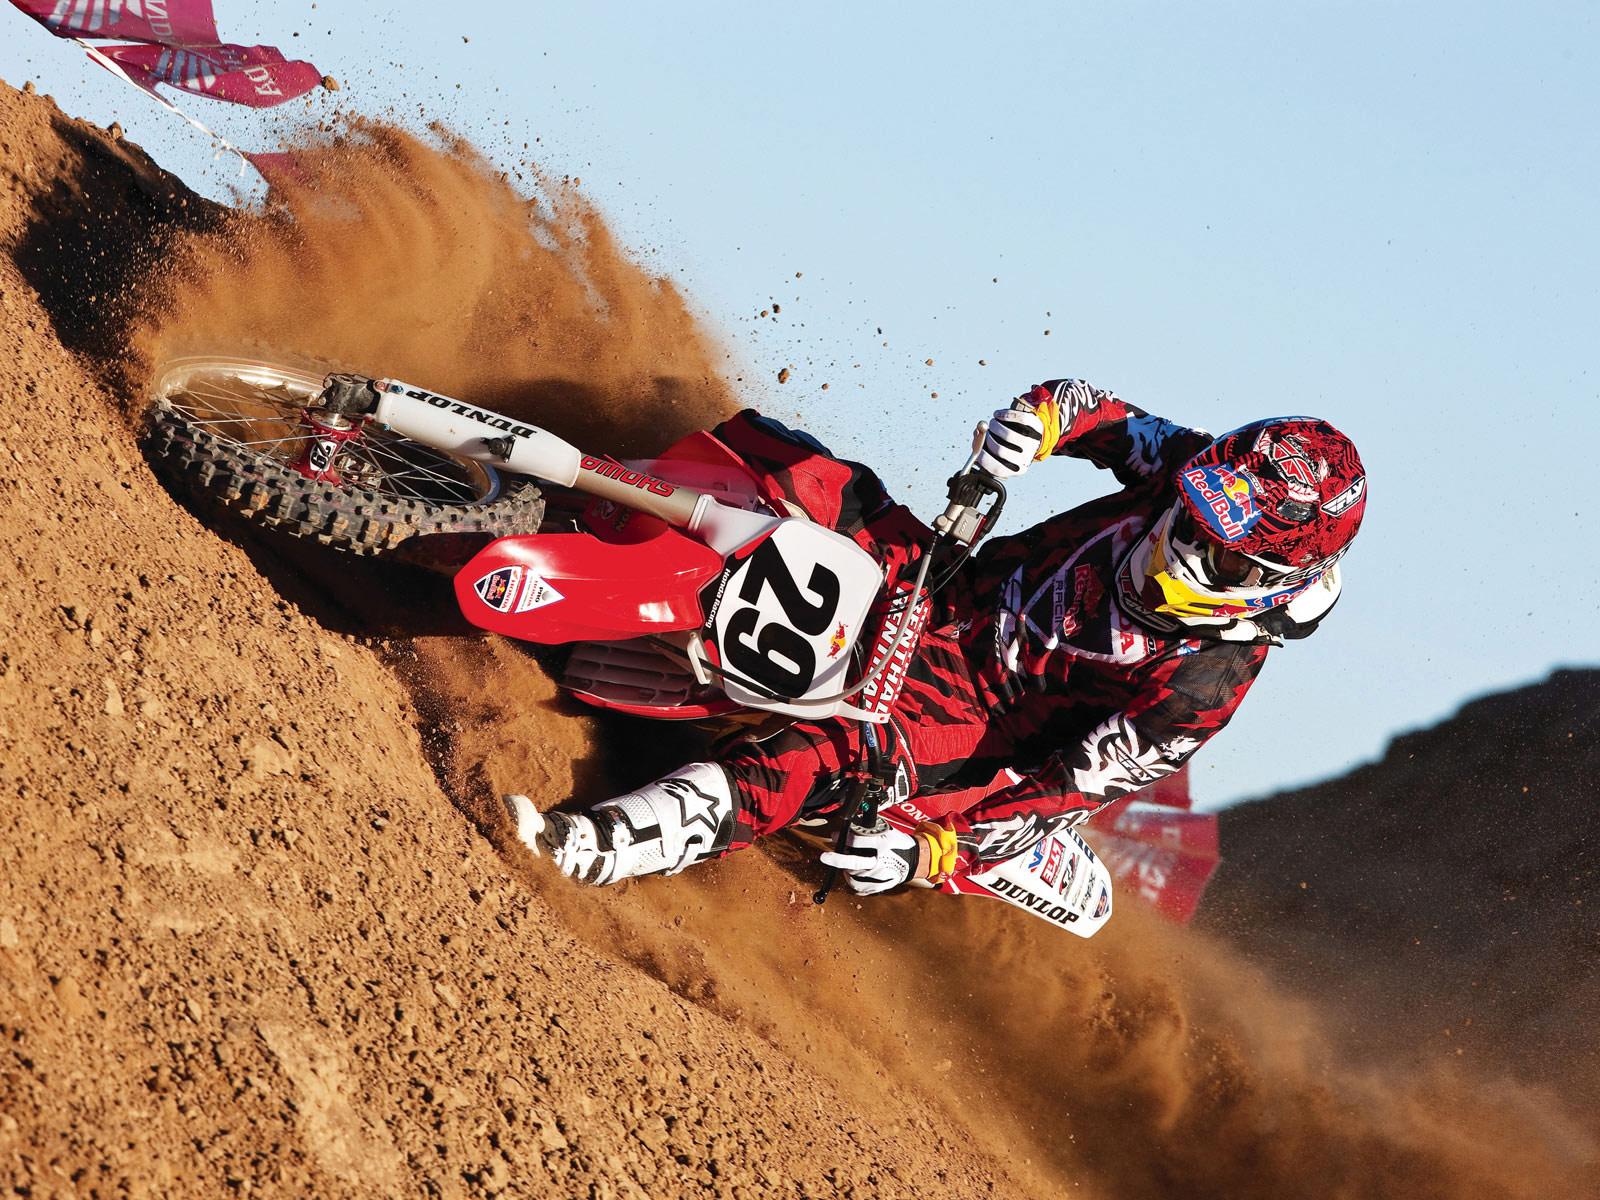 Allstate Motorcycle Insurance >> HONDA Red Bull Racing Andrew Short (2010)